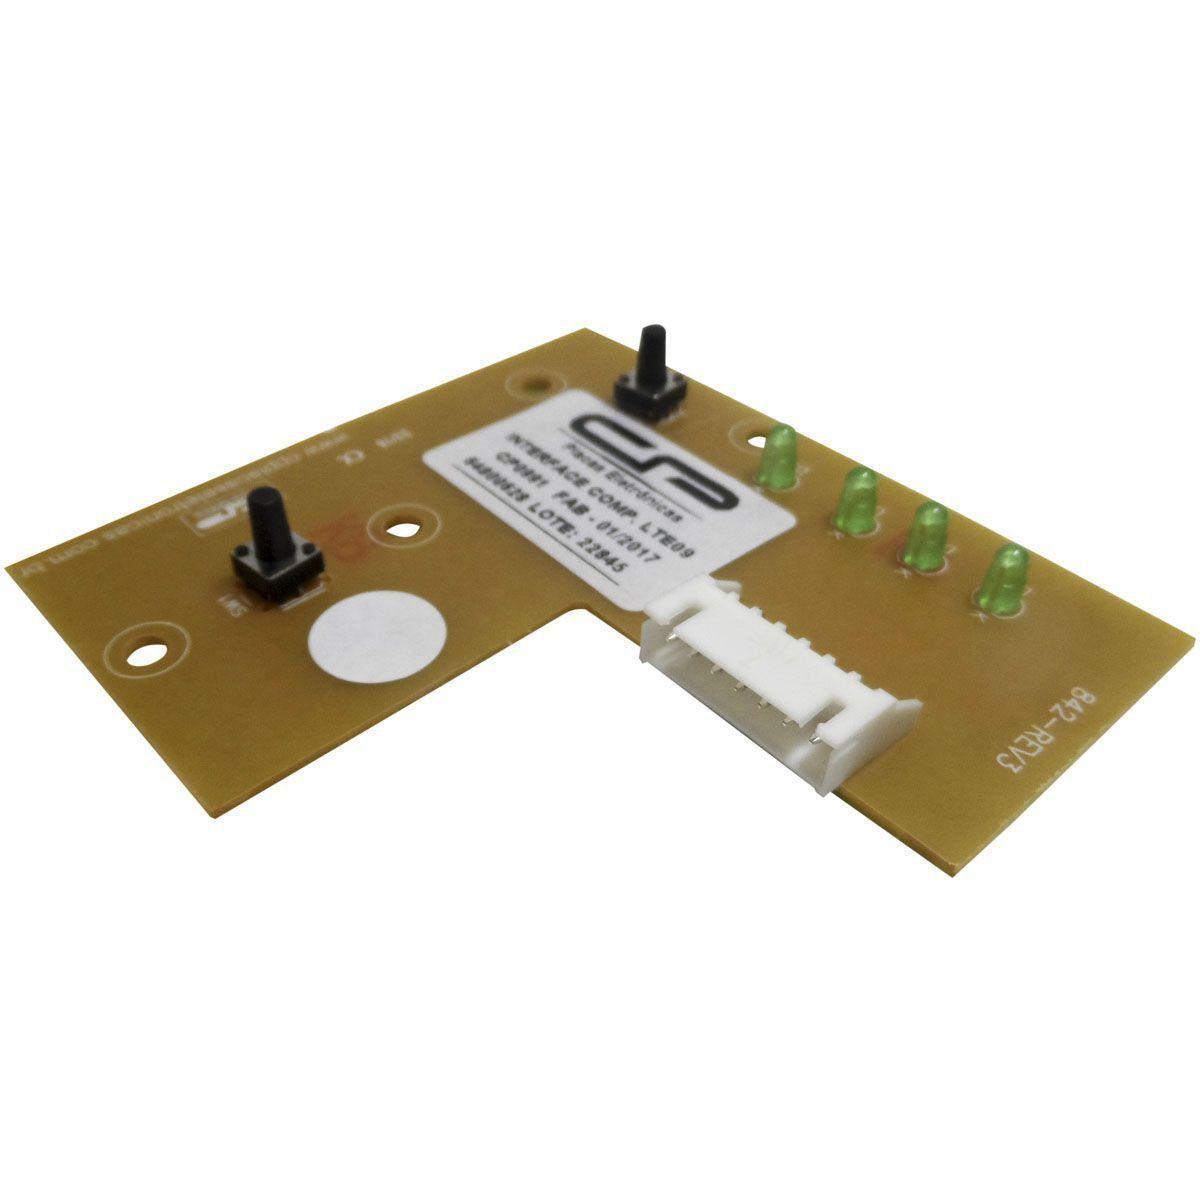 Placa Eletrônica Interface Lavadora Electrolux/C.P 64800628/64500189